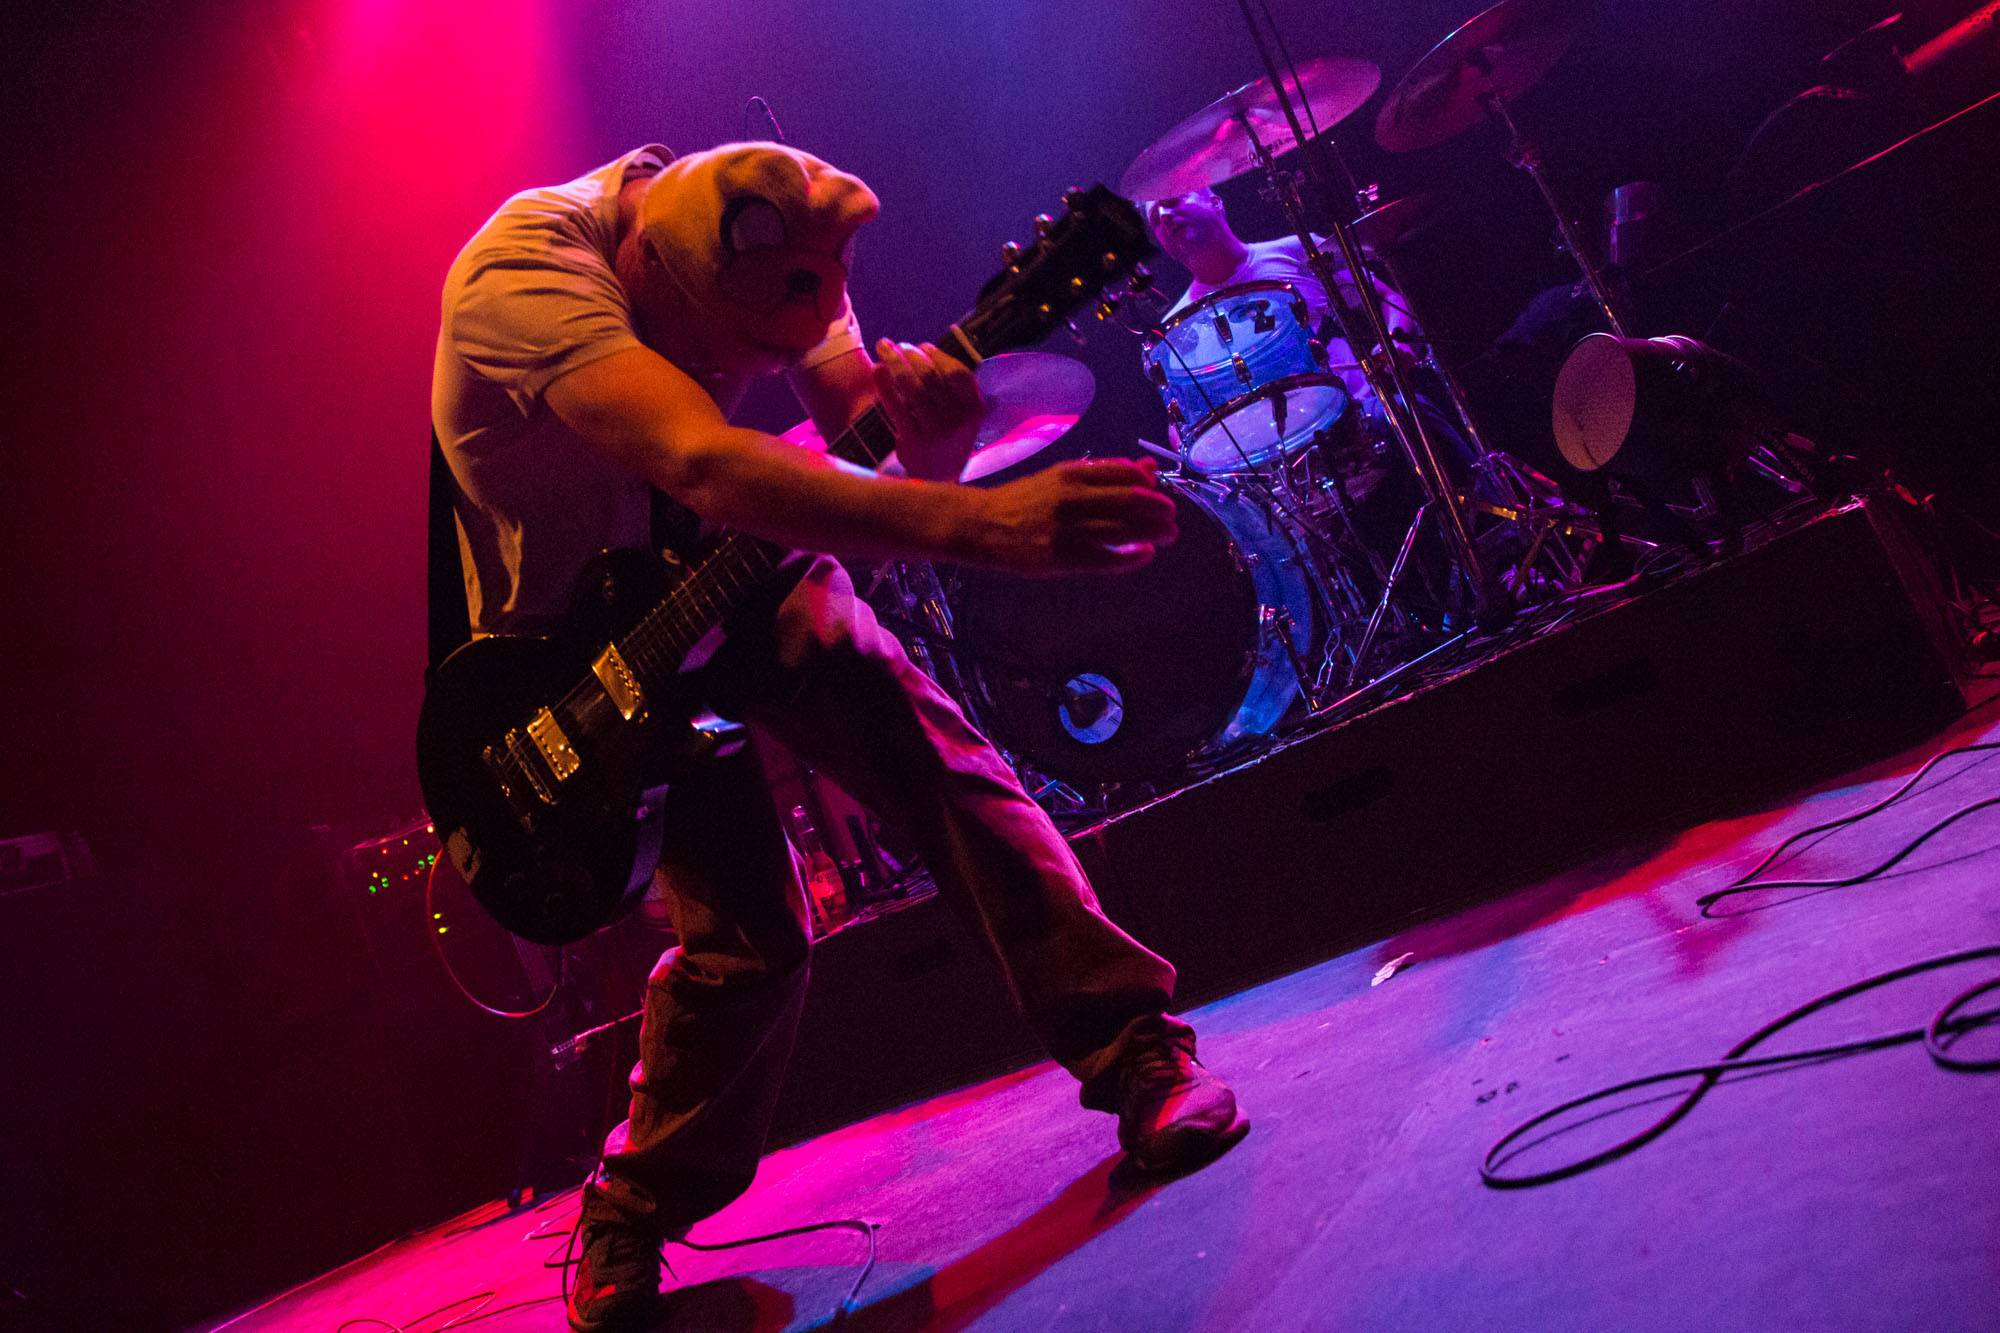 Hum at the Rickshaw Theatre, Vancouver, Sept 21 2015. Kirk Chantraine photo.